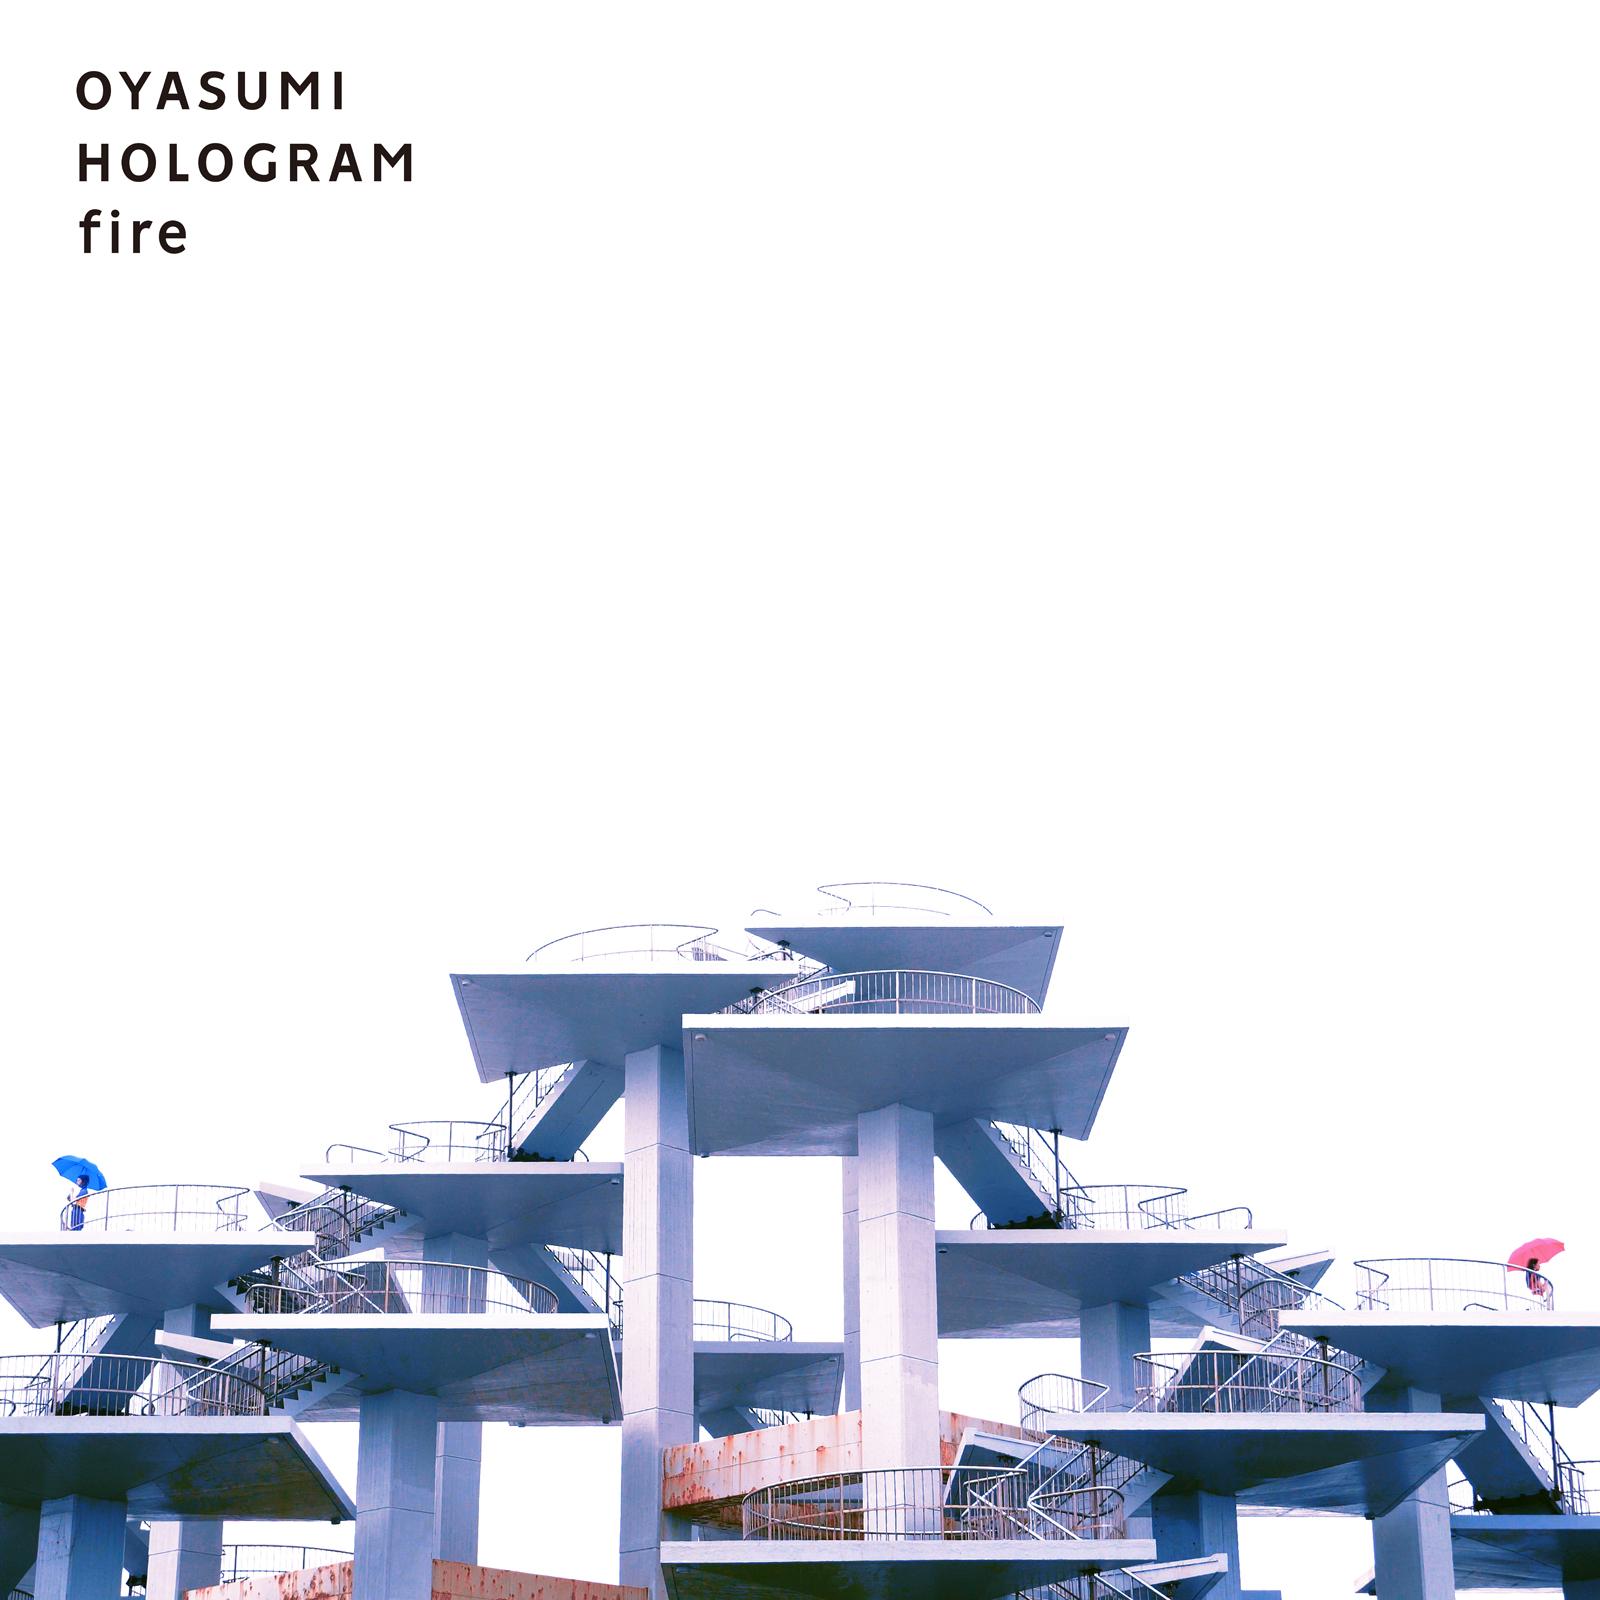 Oyasumi Hologram (おやすみホログラム) – fire [FLAC / WEB] [2018.09.21]